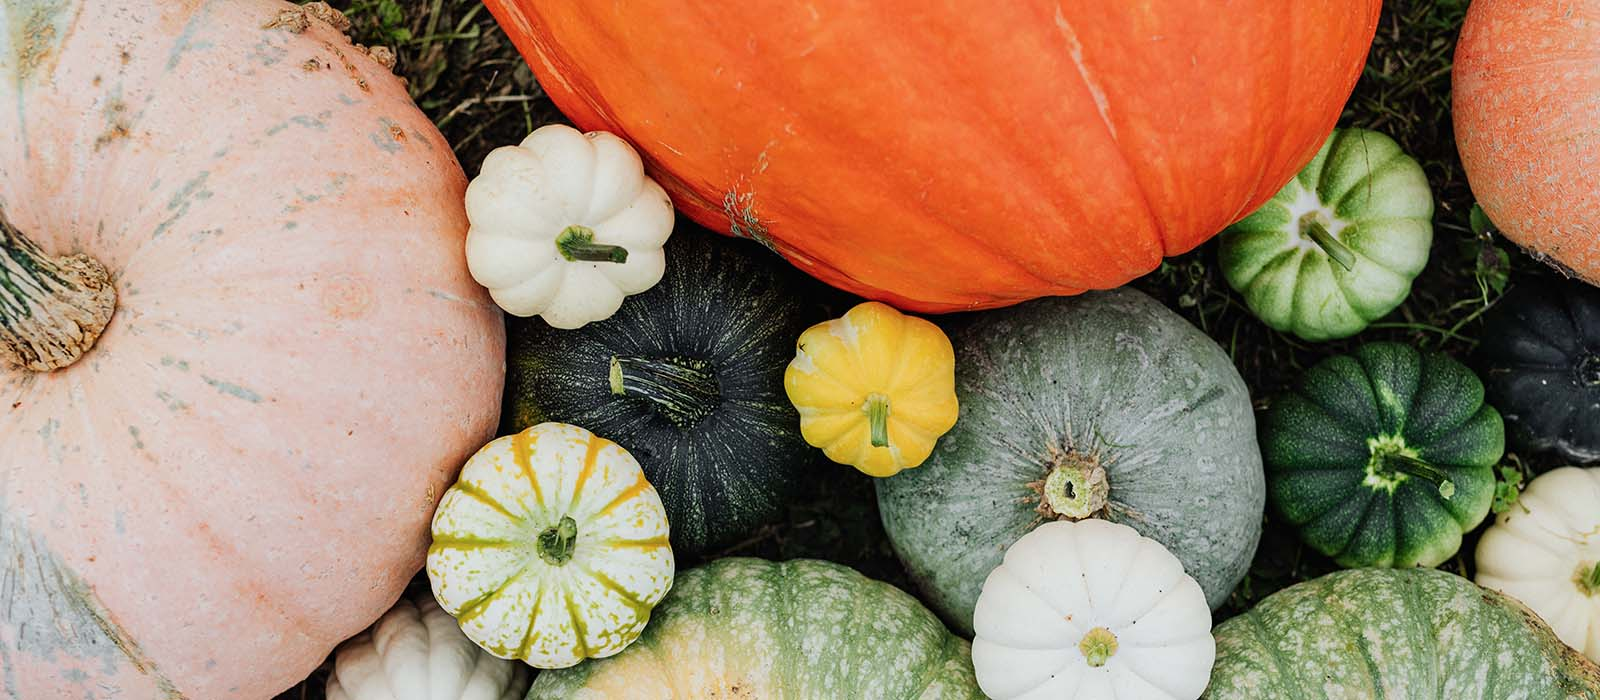 It's Pumpkin Time Again: Health Benefits & Bonus Recipe